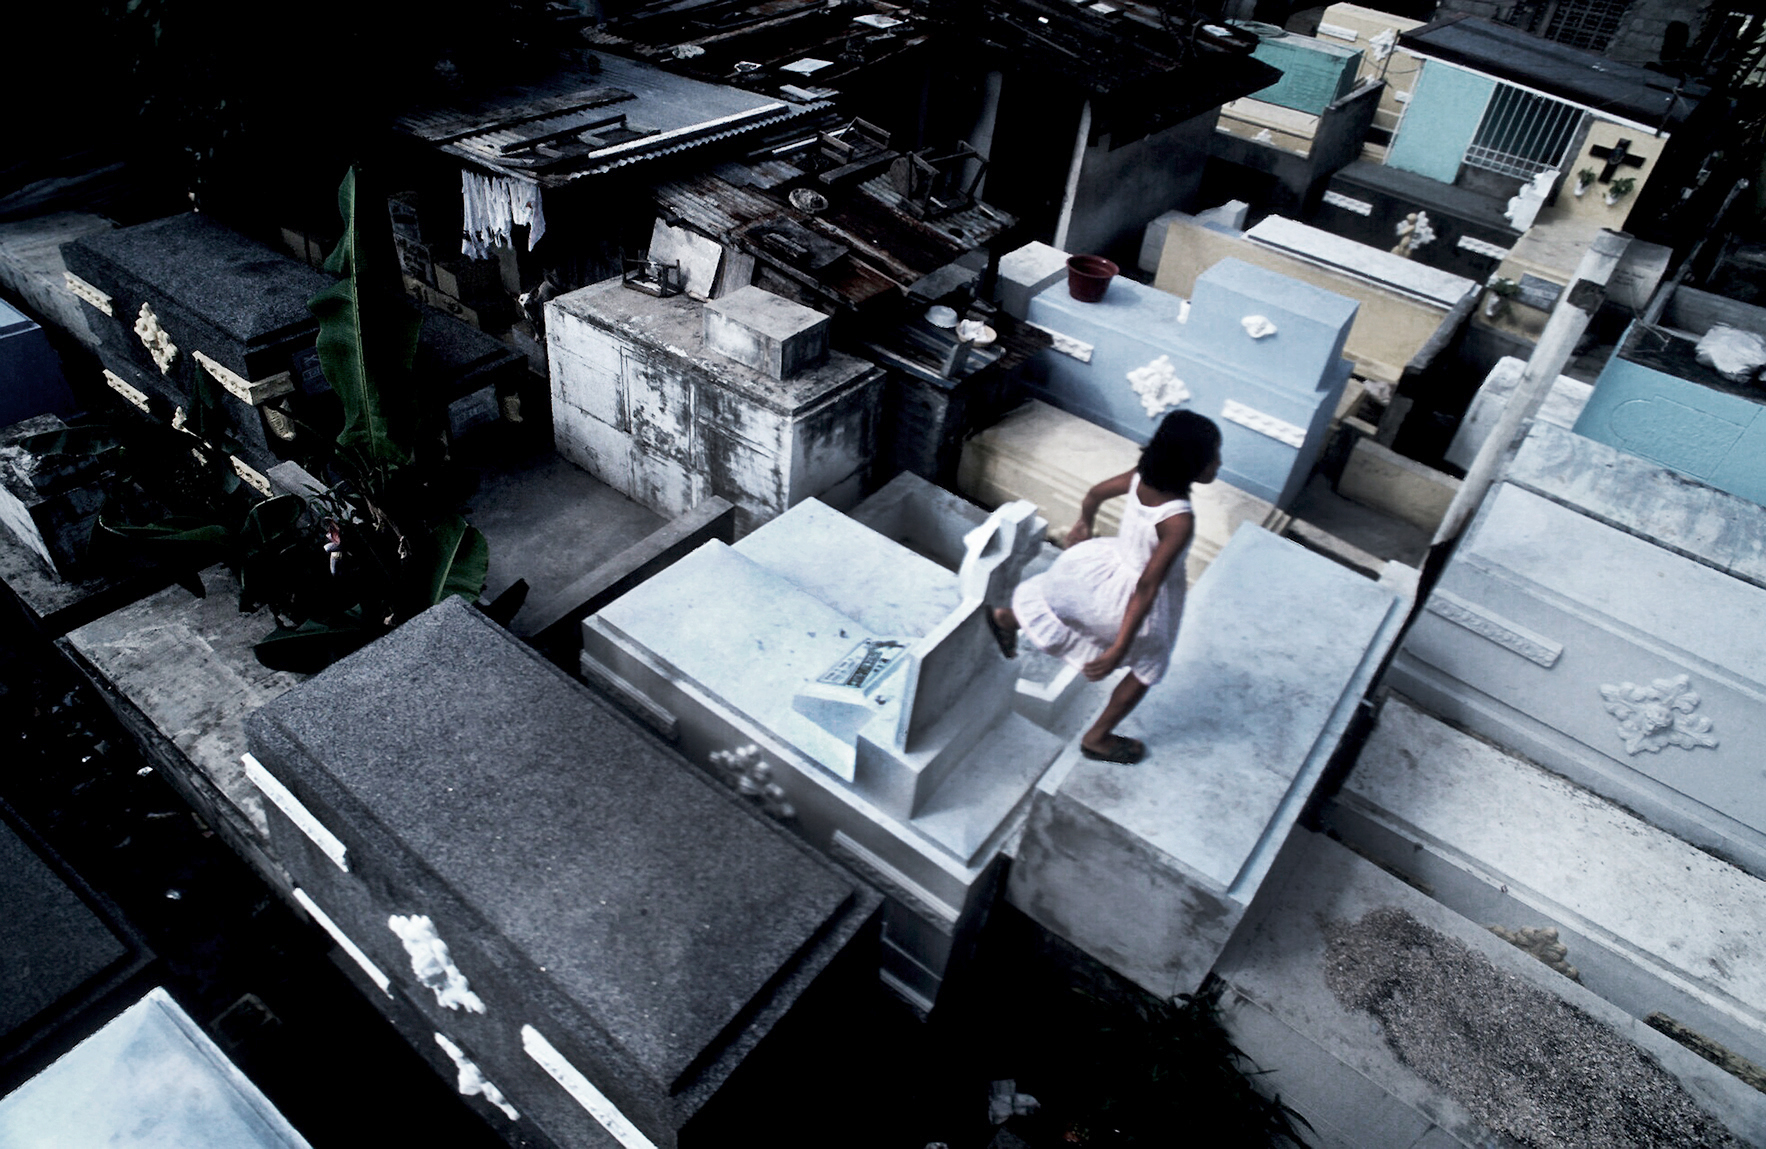 On the way to school. Manila's Catholic cemetery. The Philippines. 1994